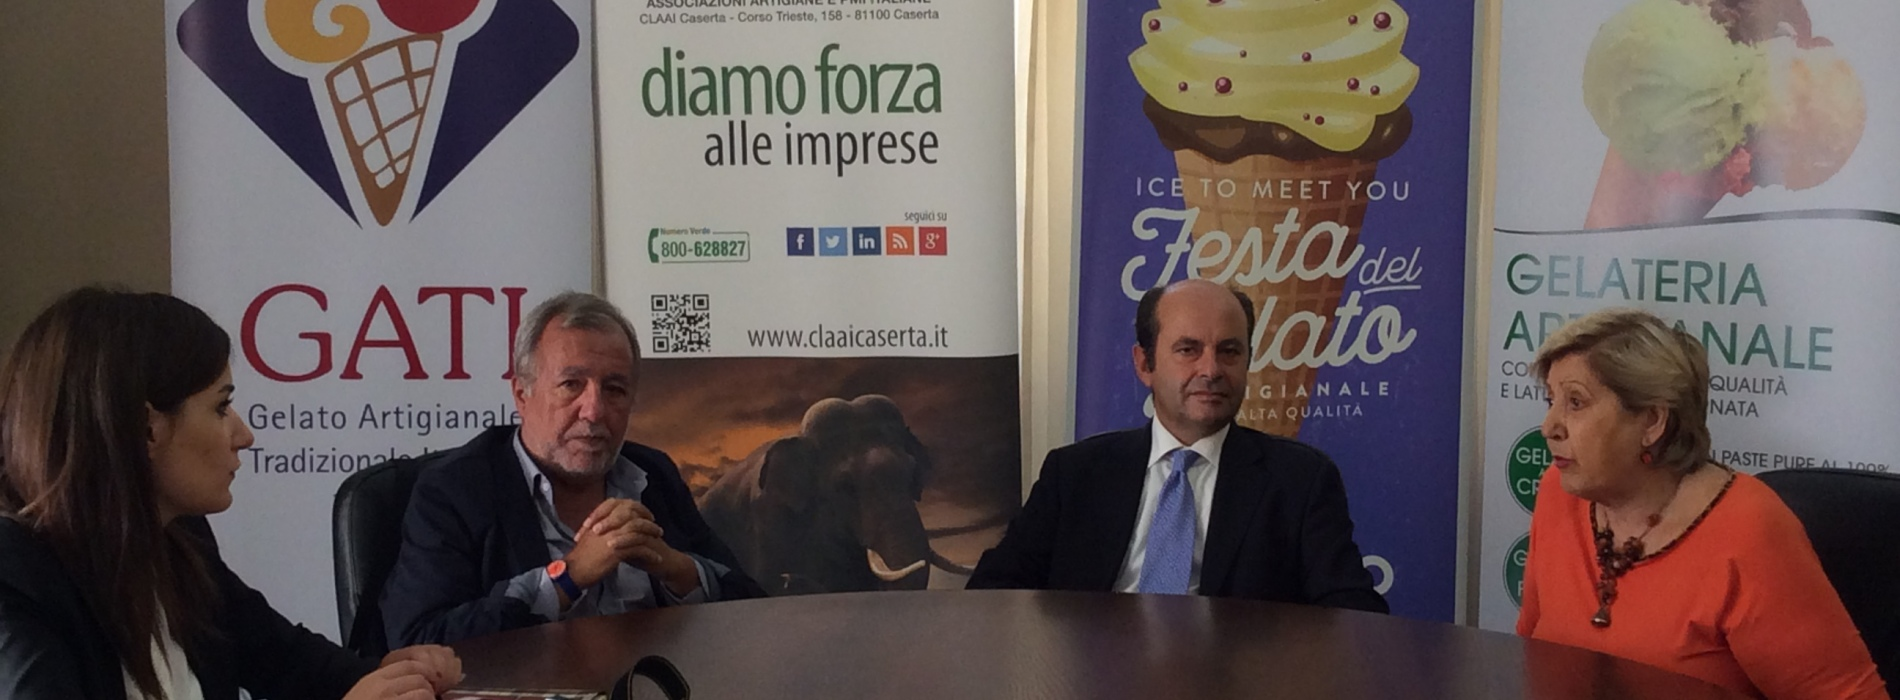 Festa del gelato. Dolce week end a Caserta